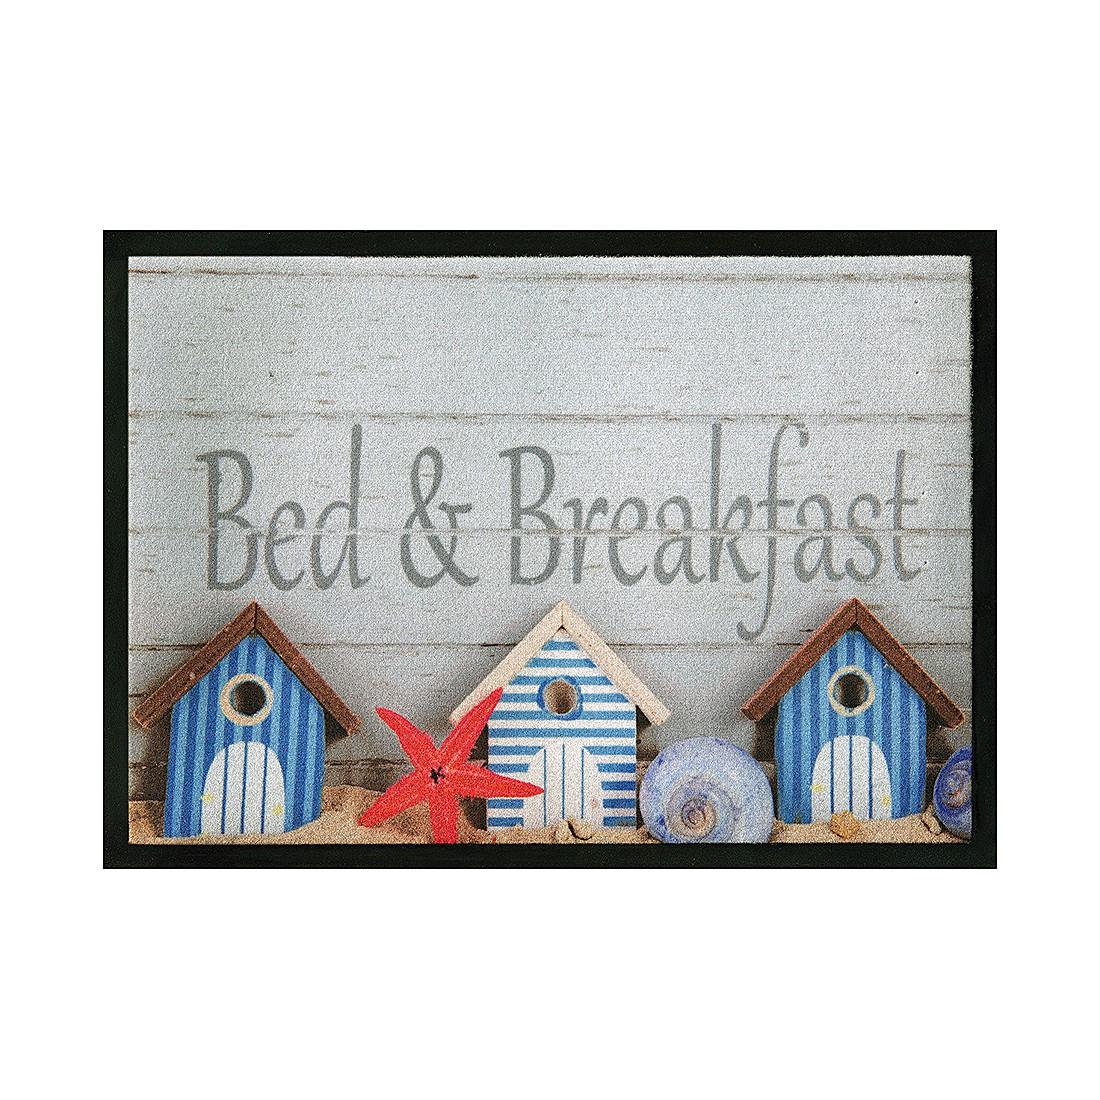 Fußmatte Bed & Breakfast – Mehrfarbig, Pro Art jetzt bestellen